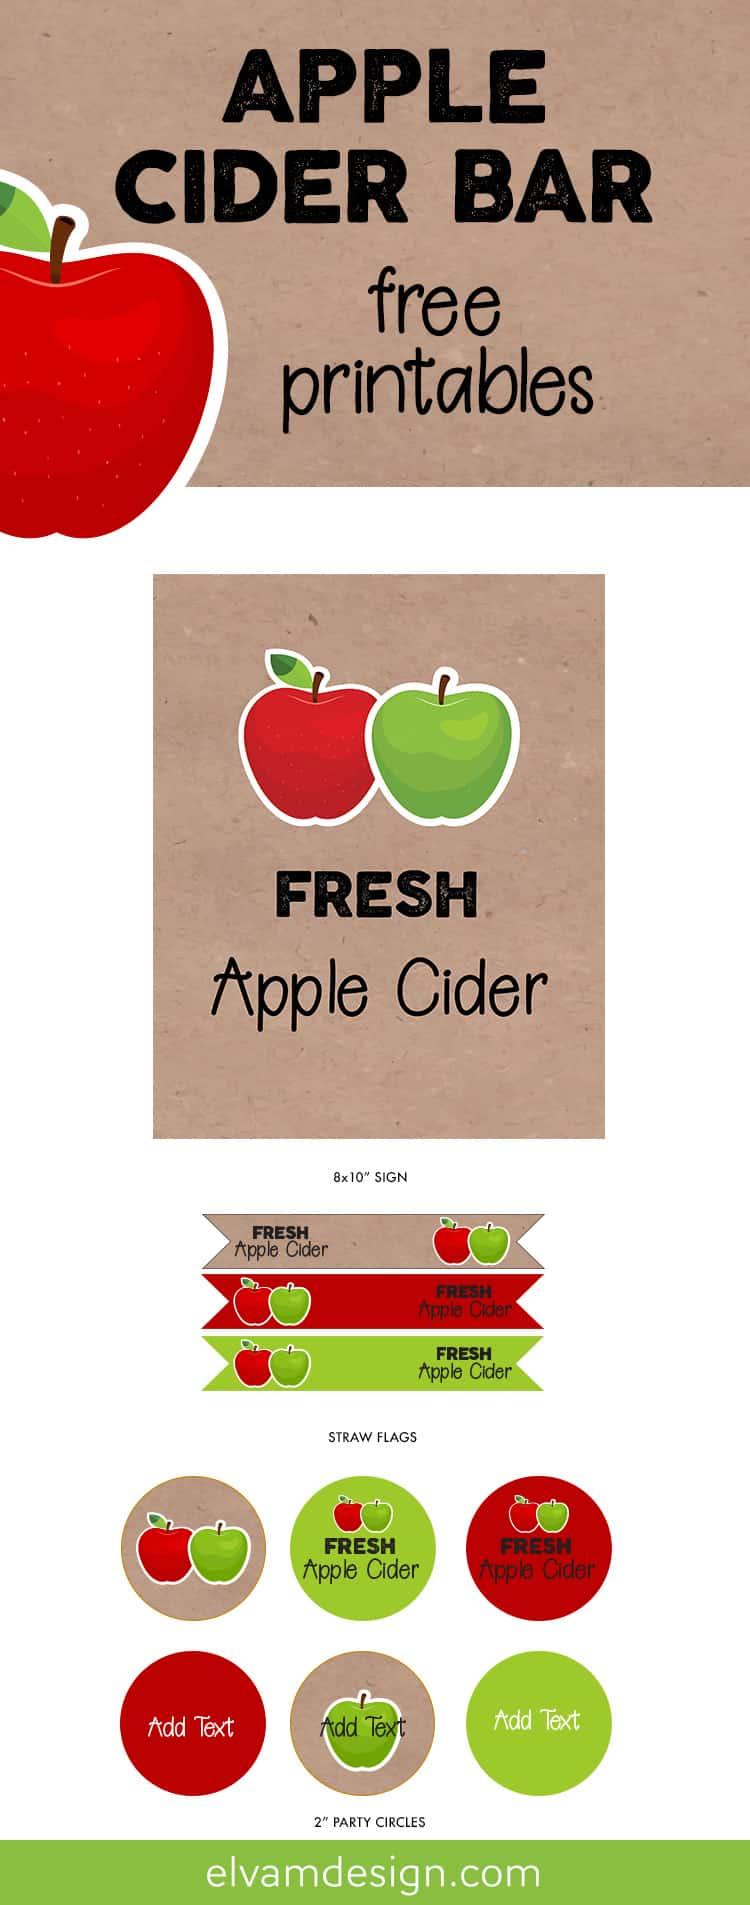 Free Fall Apple Cider Bar Printable from Elva M Design